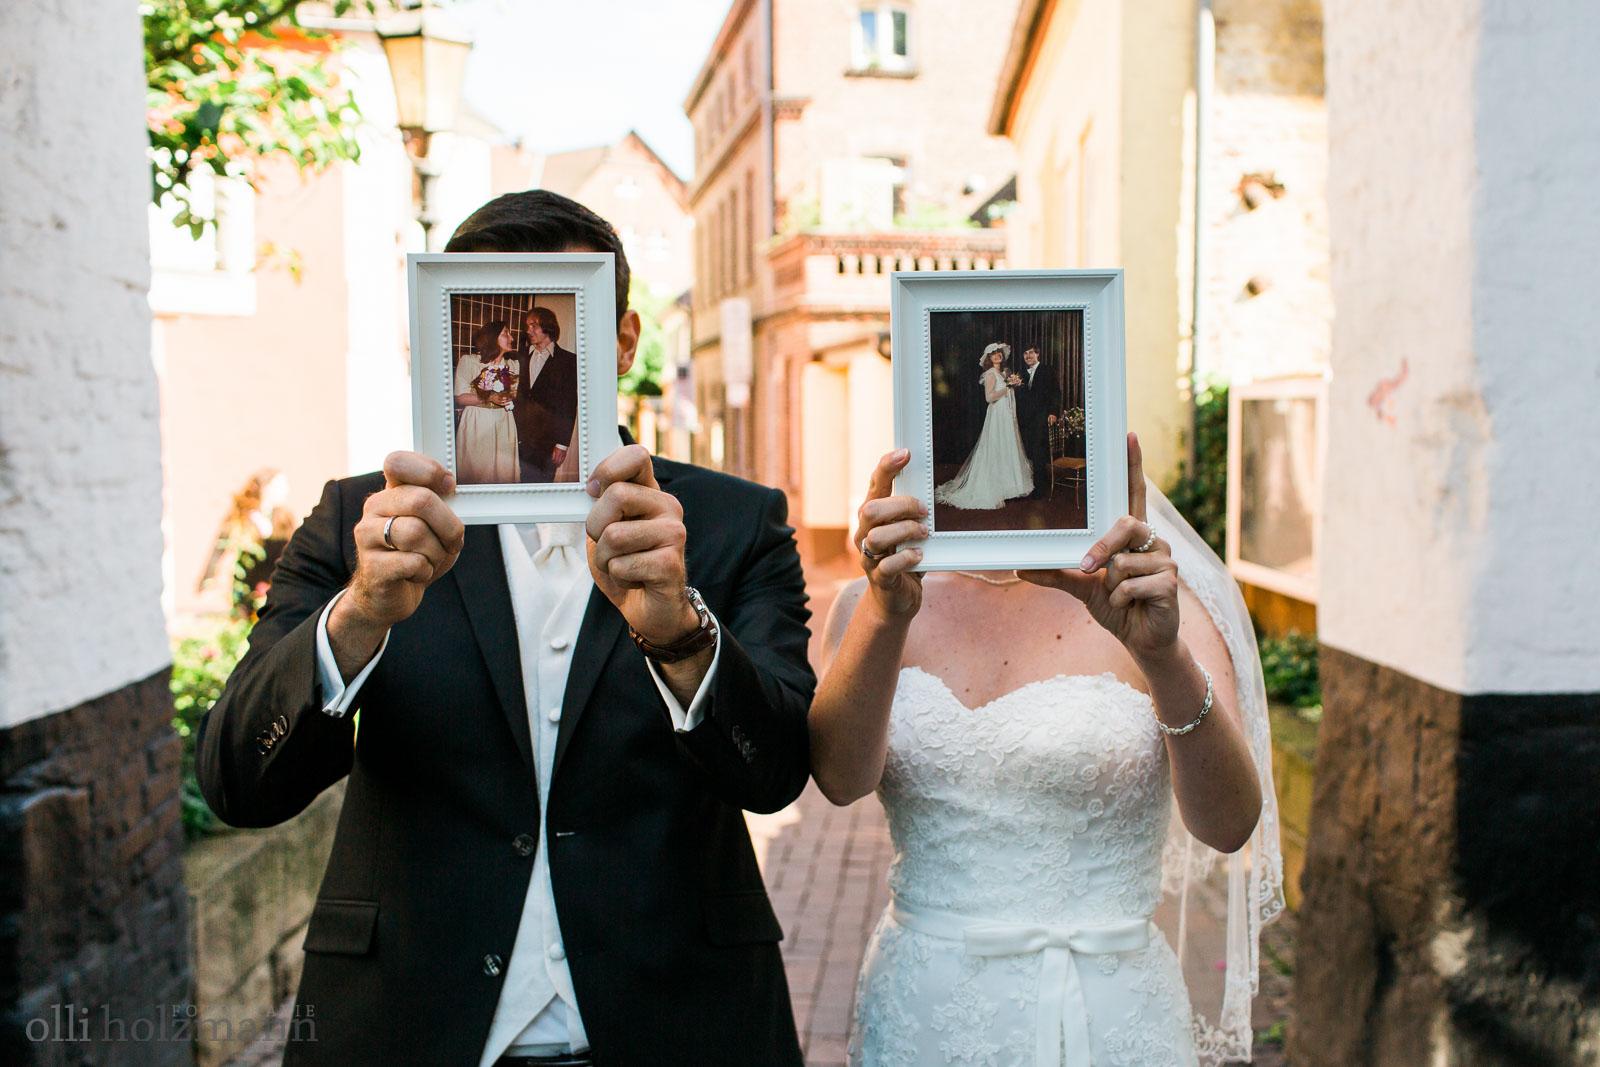 Hochzeitsfotograf nrw-68.jpg